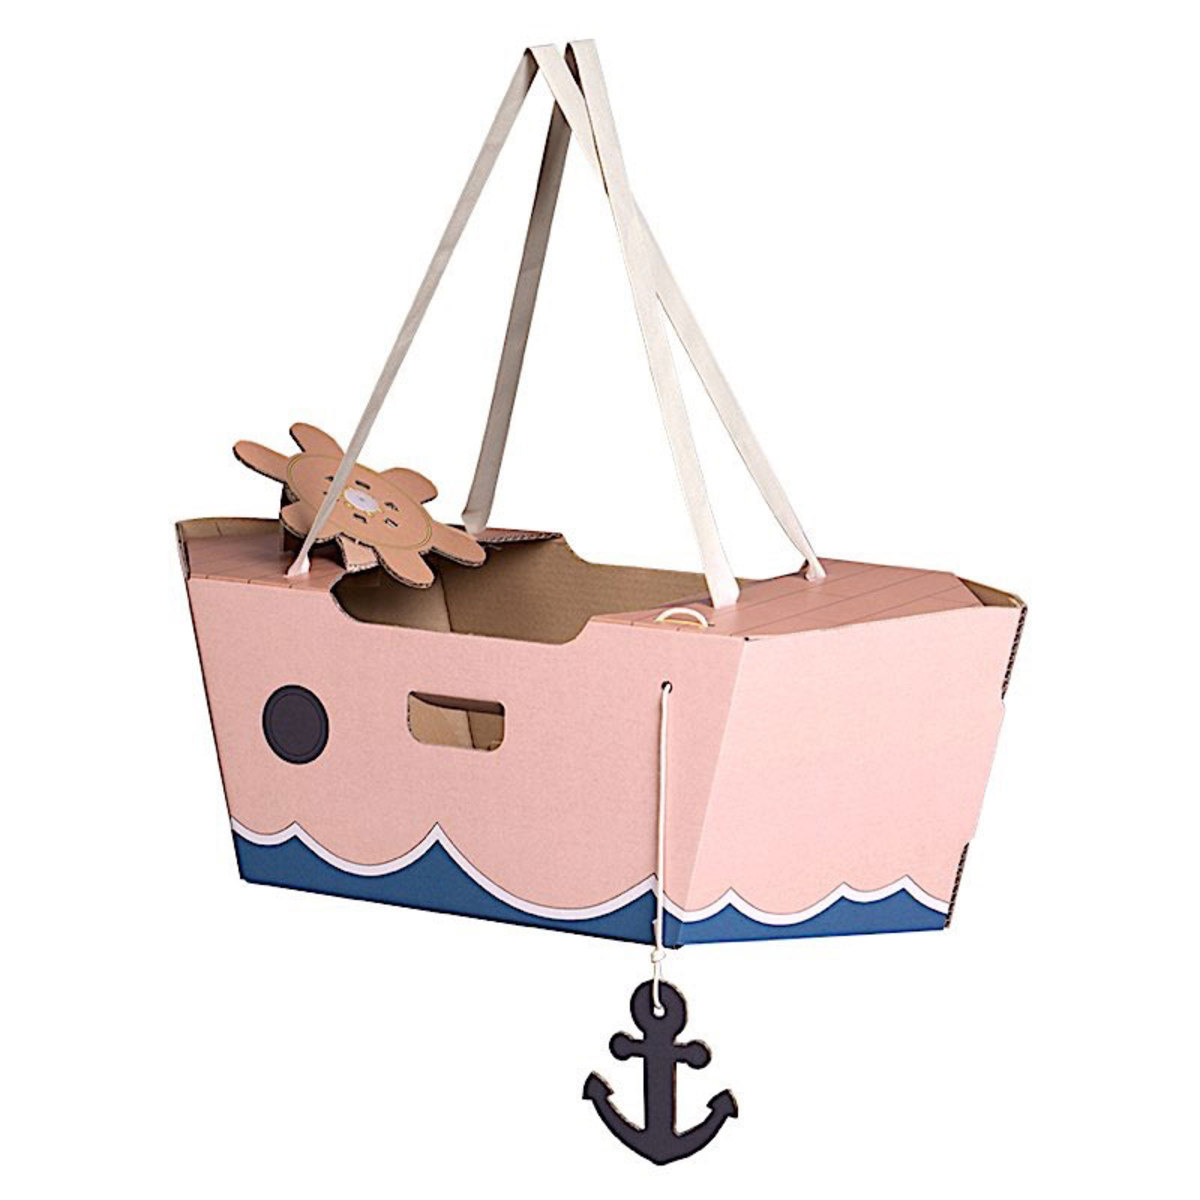 Mes premiers jouets Tody Boat Rose